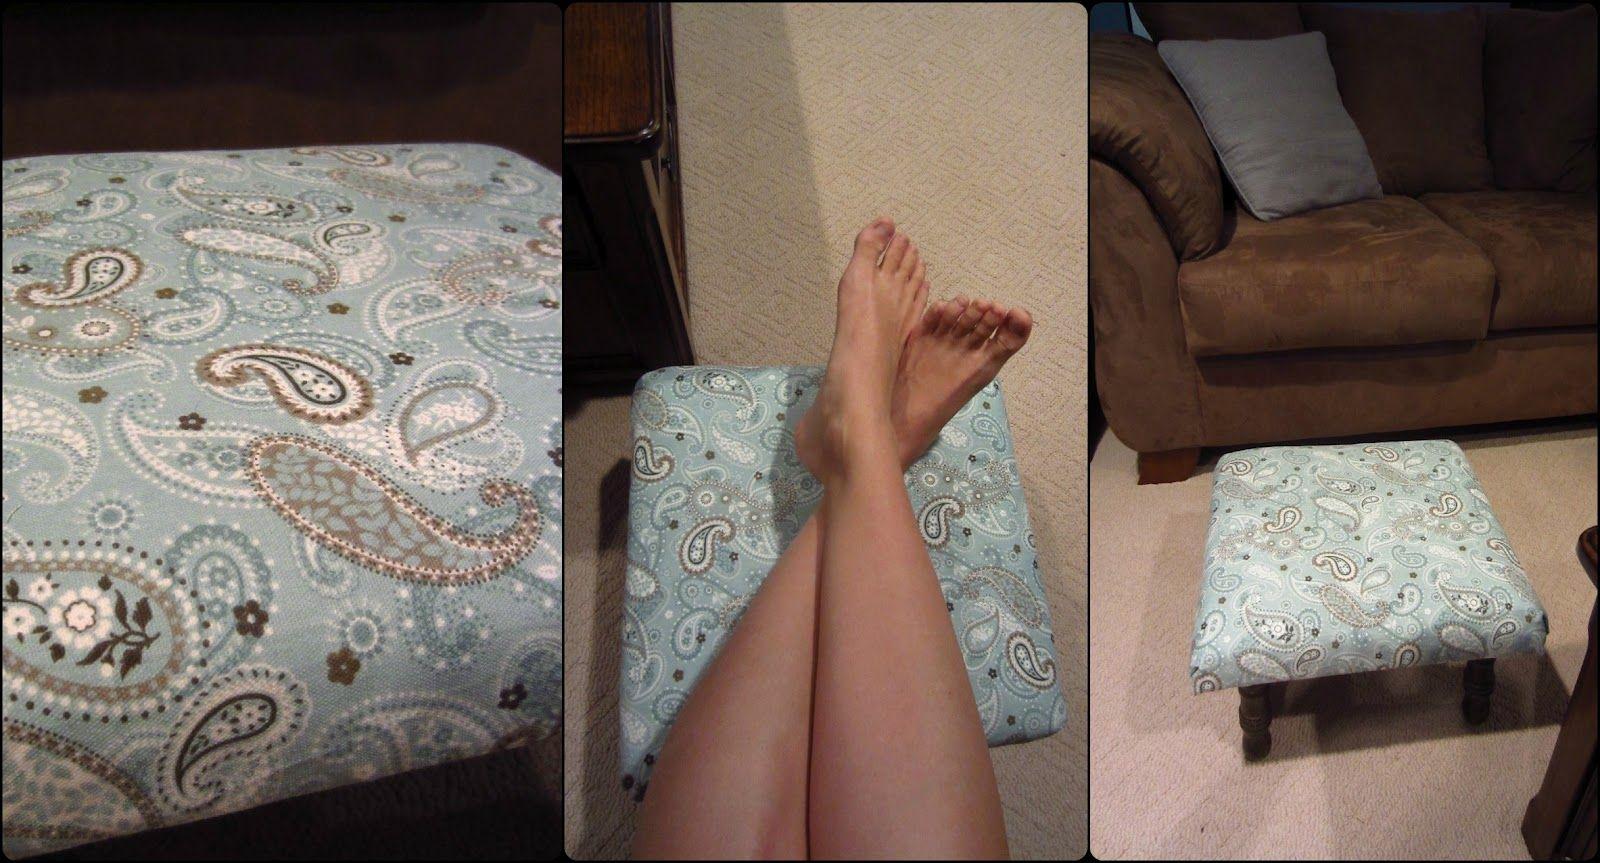 Pedestal re-upholstery